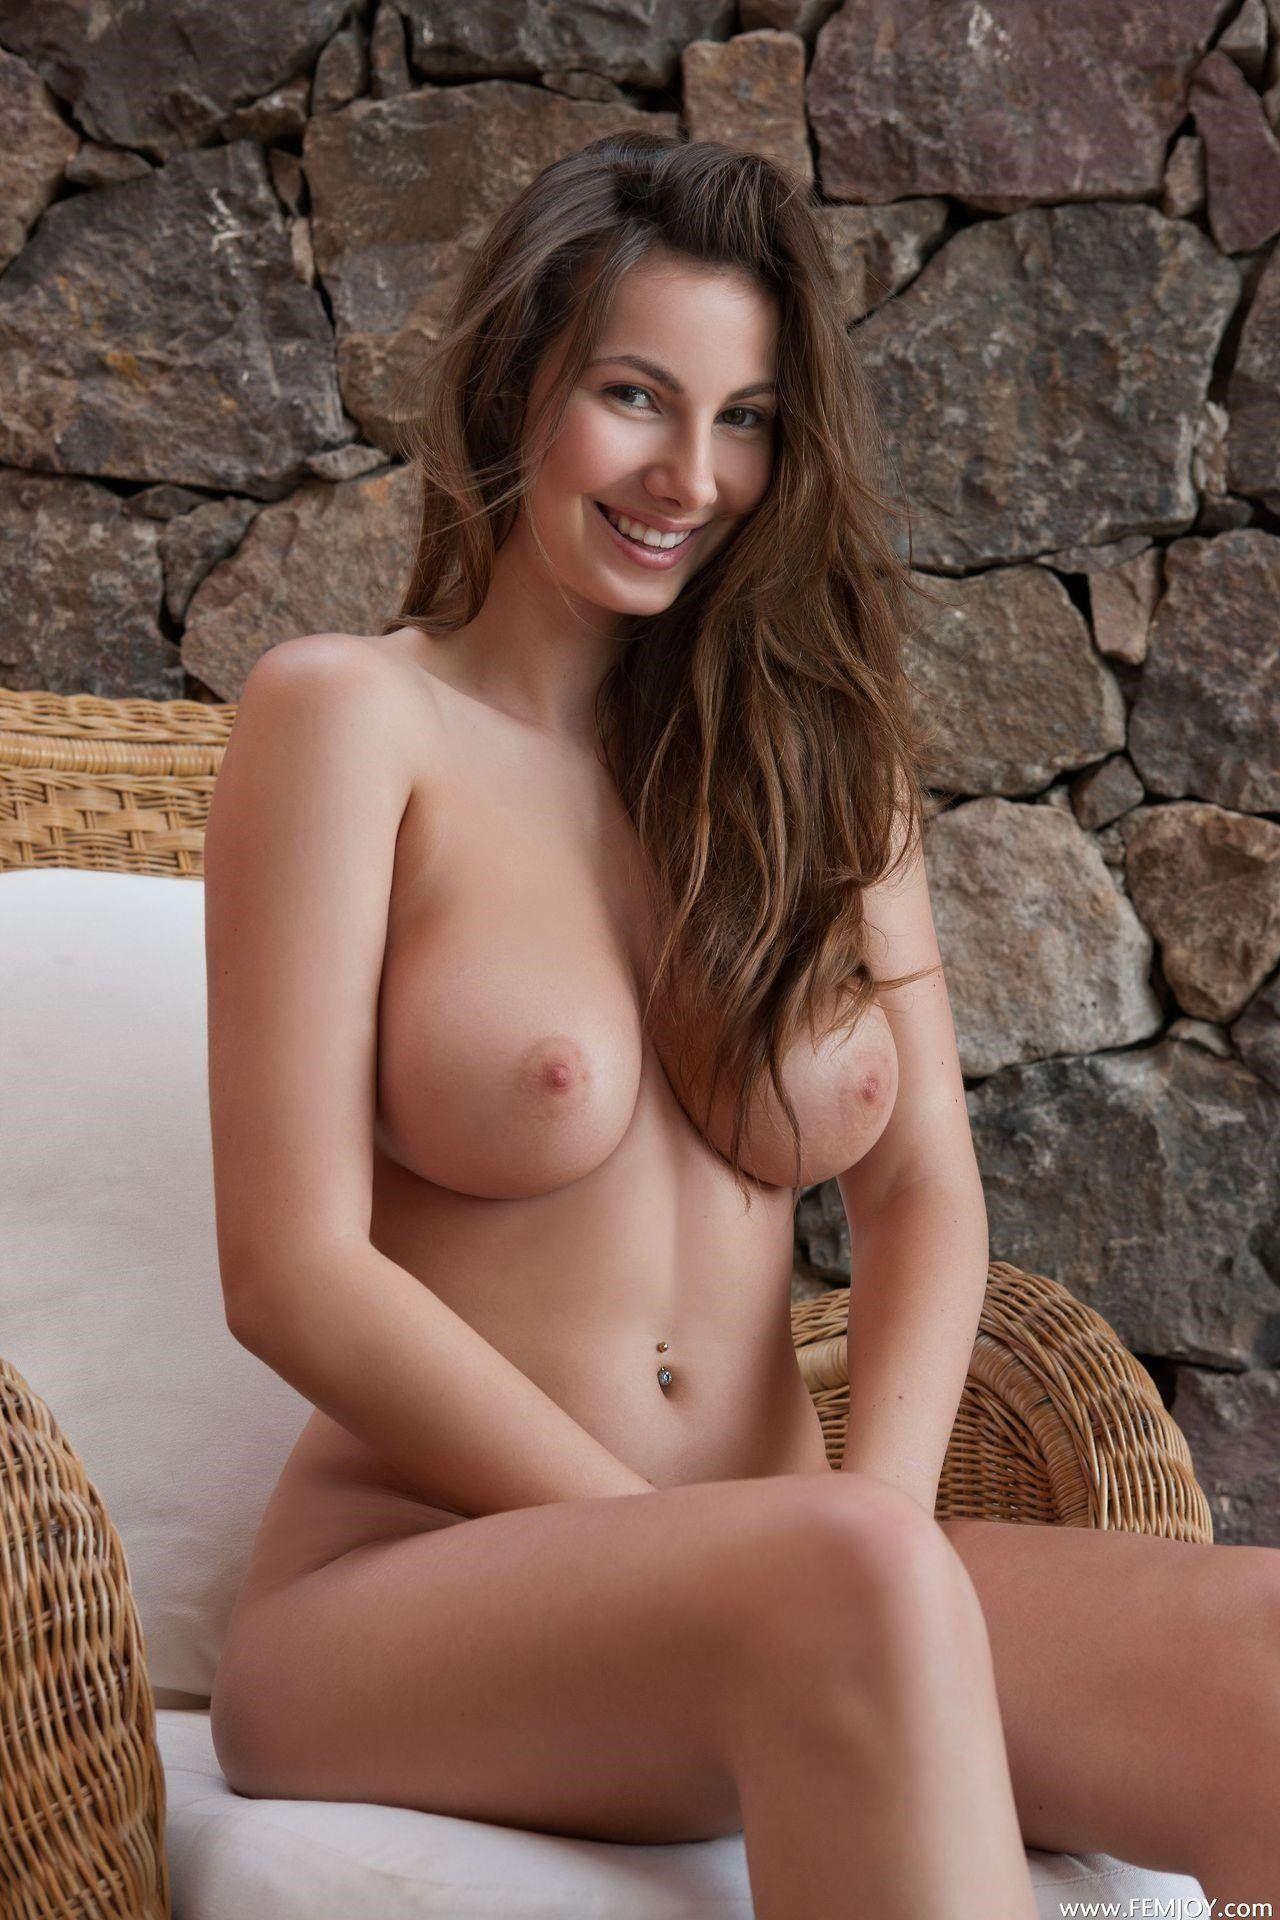 Connie carter nude videos